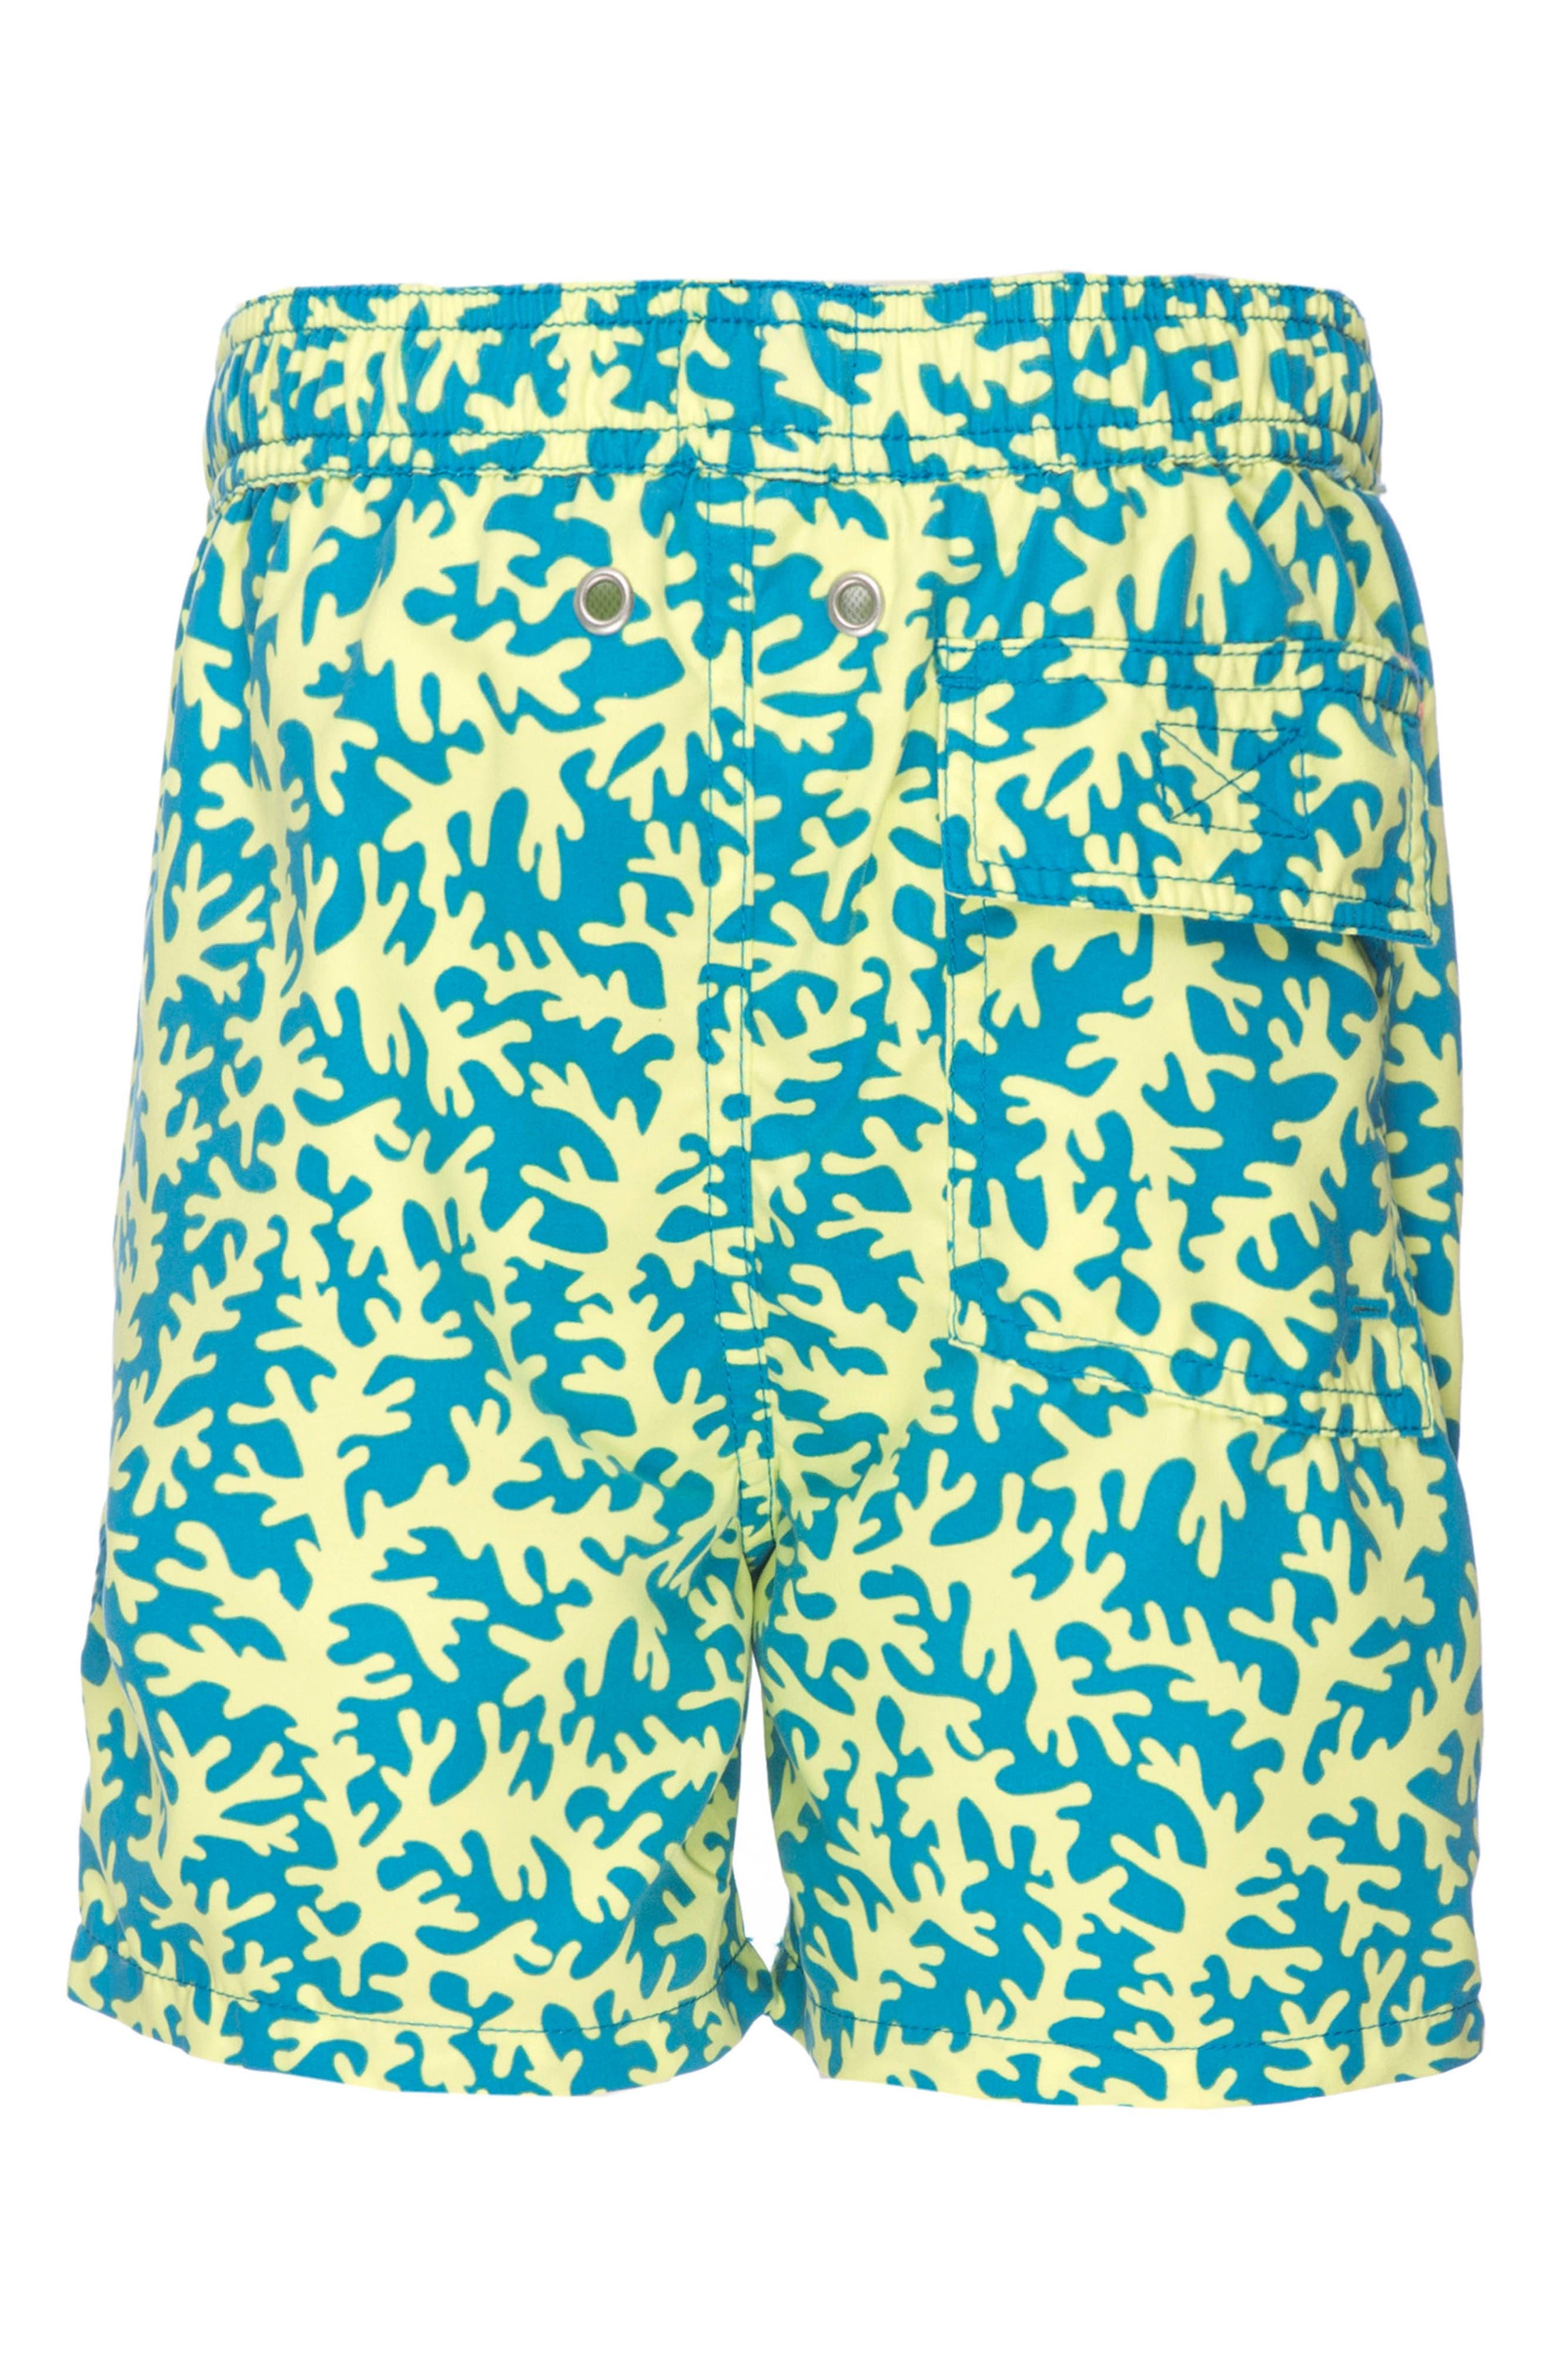 Coral Swim Trunks,                             Alternate thumbnail 3, color,